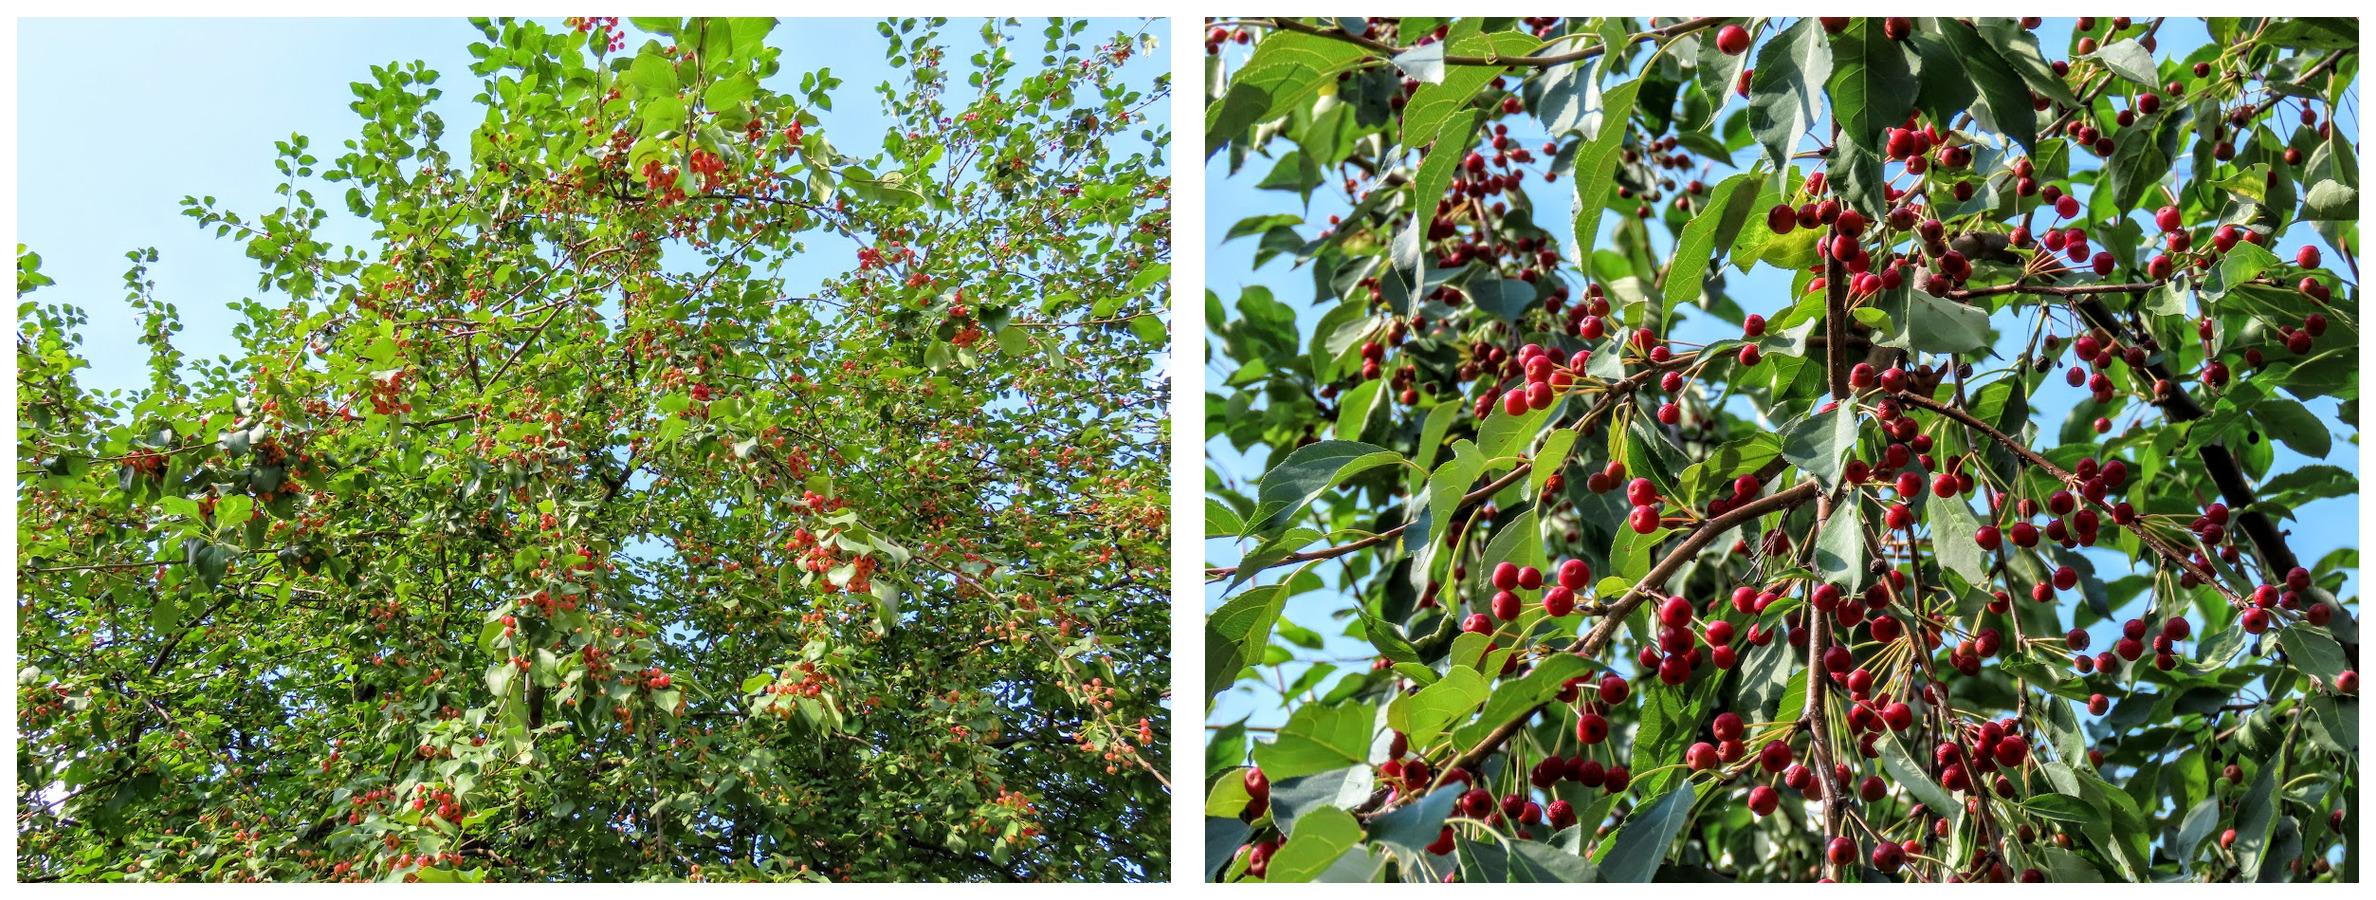 Засентябрило. По старому стилю ещё лето, осень начнётся 14 августа)38 фото imgonline-com-ua-Collage-x-J8-XCVd-Y5-ZR5